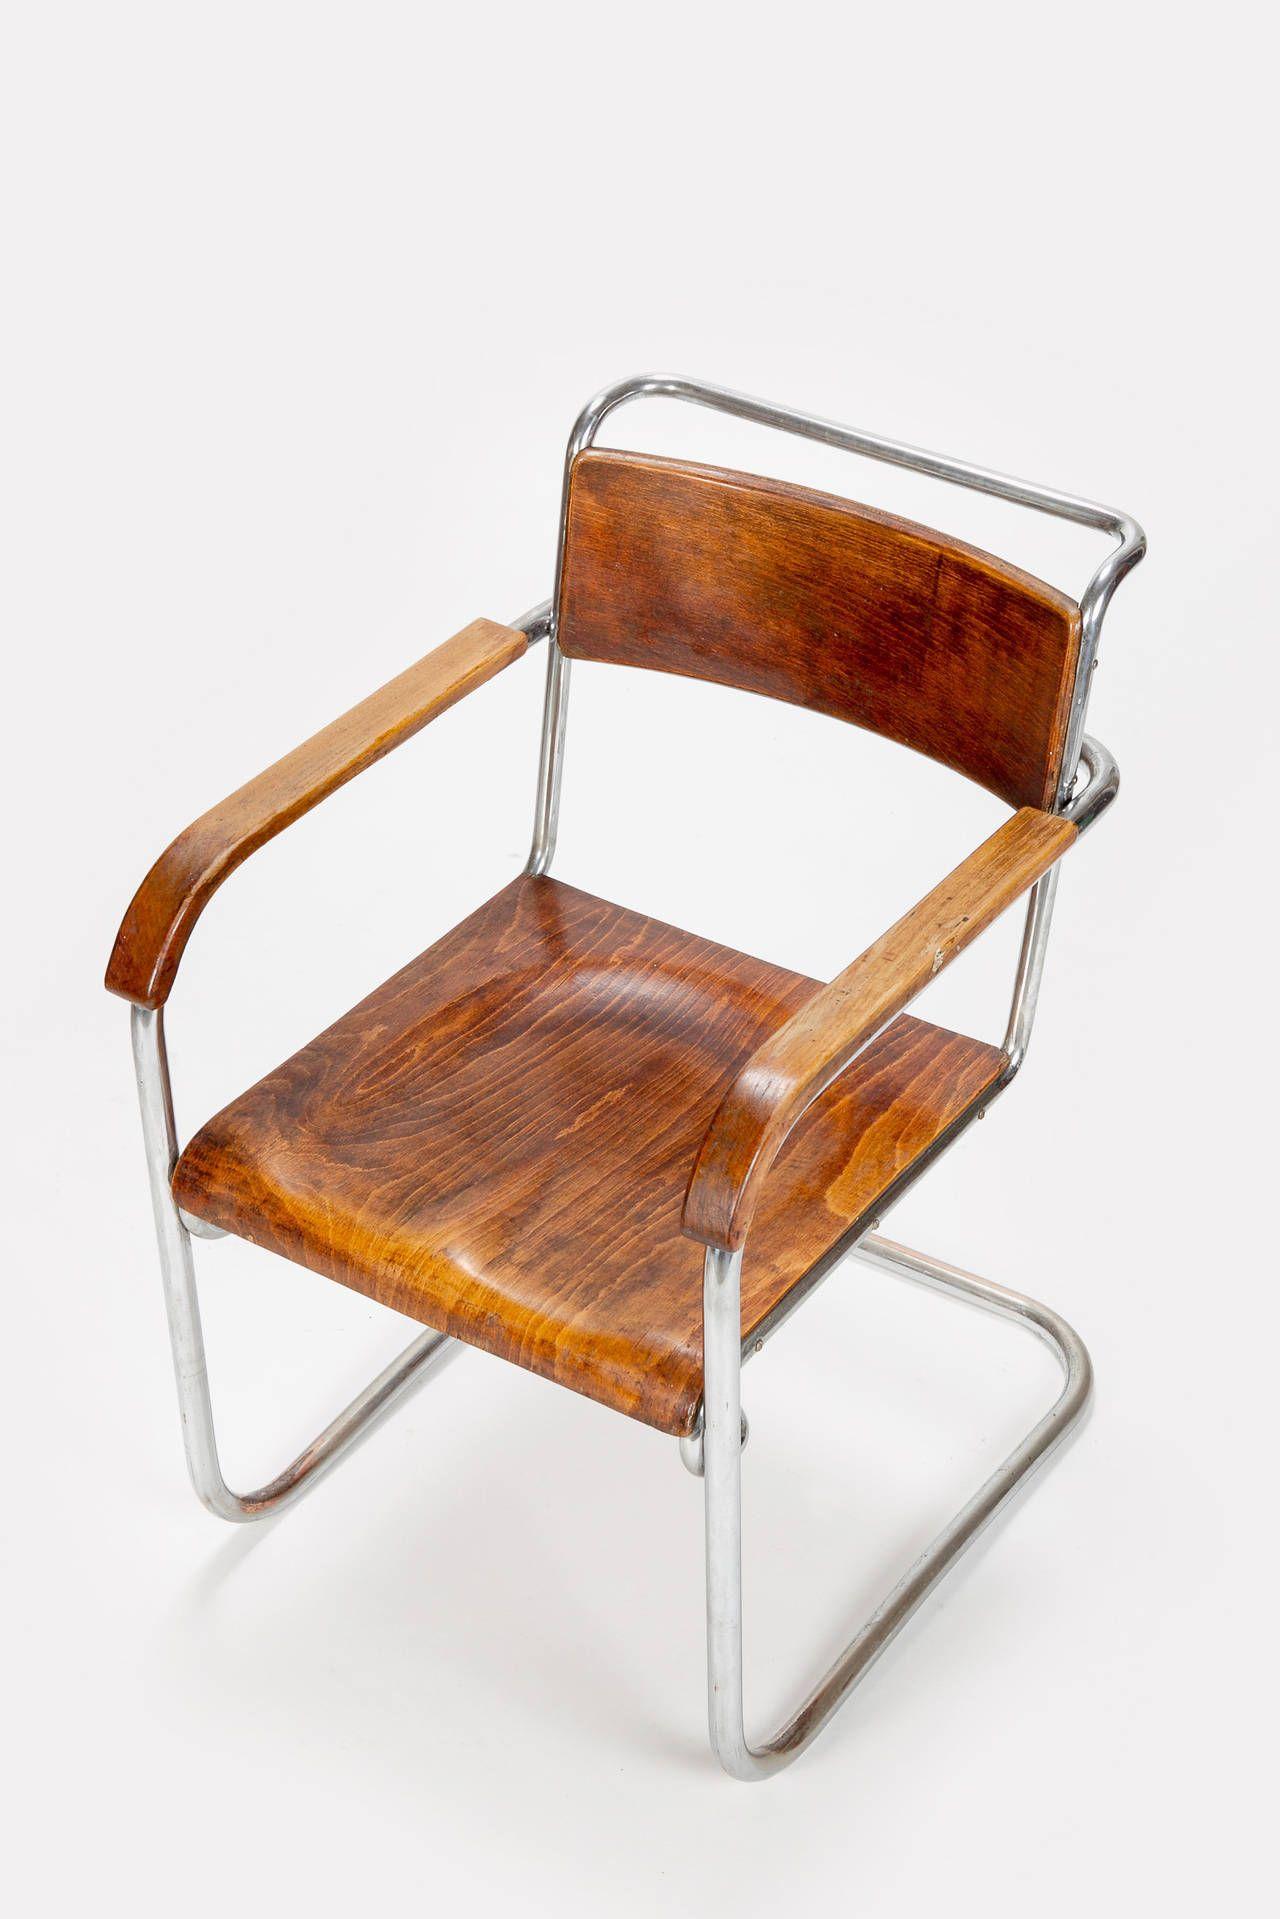 Italian Bauhaus Desk And Chair By Marcel Breuer 1930s Marcel  # Muebles Peter Behrens